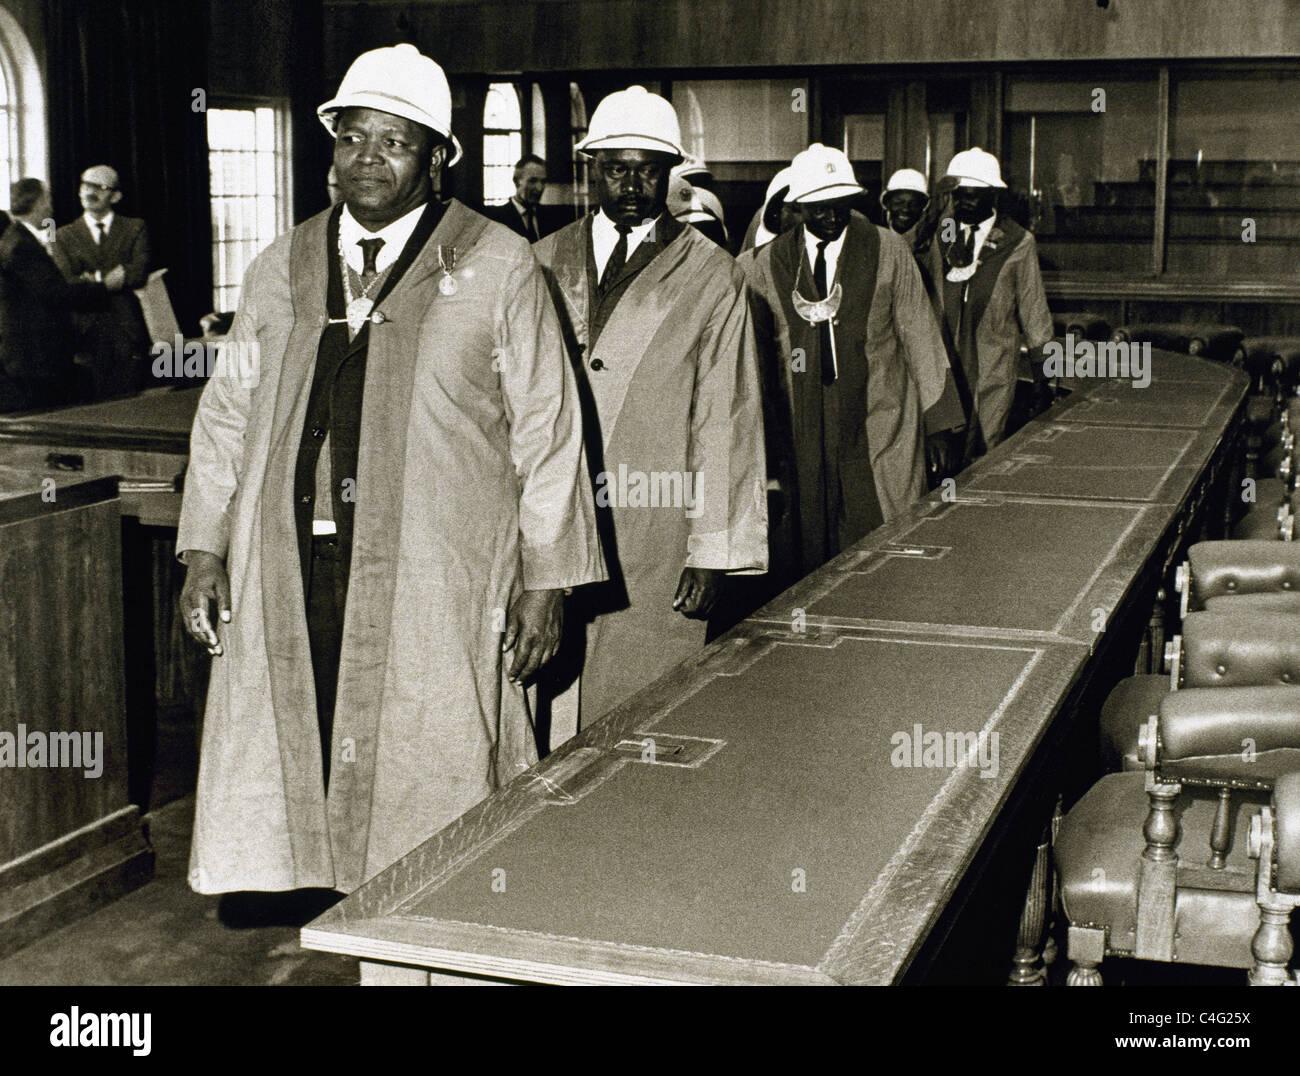 Rhodesia (May 7, 1970). Election of senators. - Stock Image